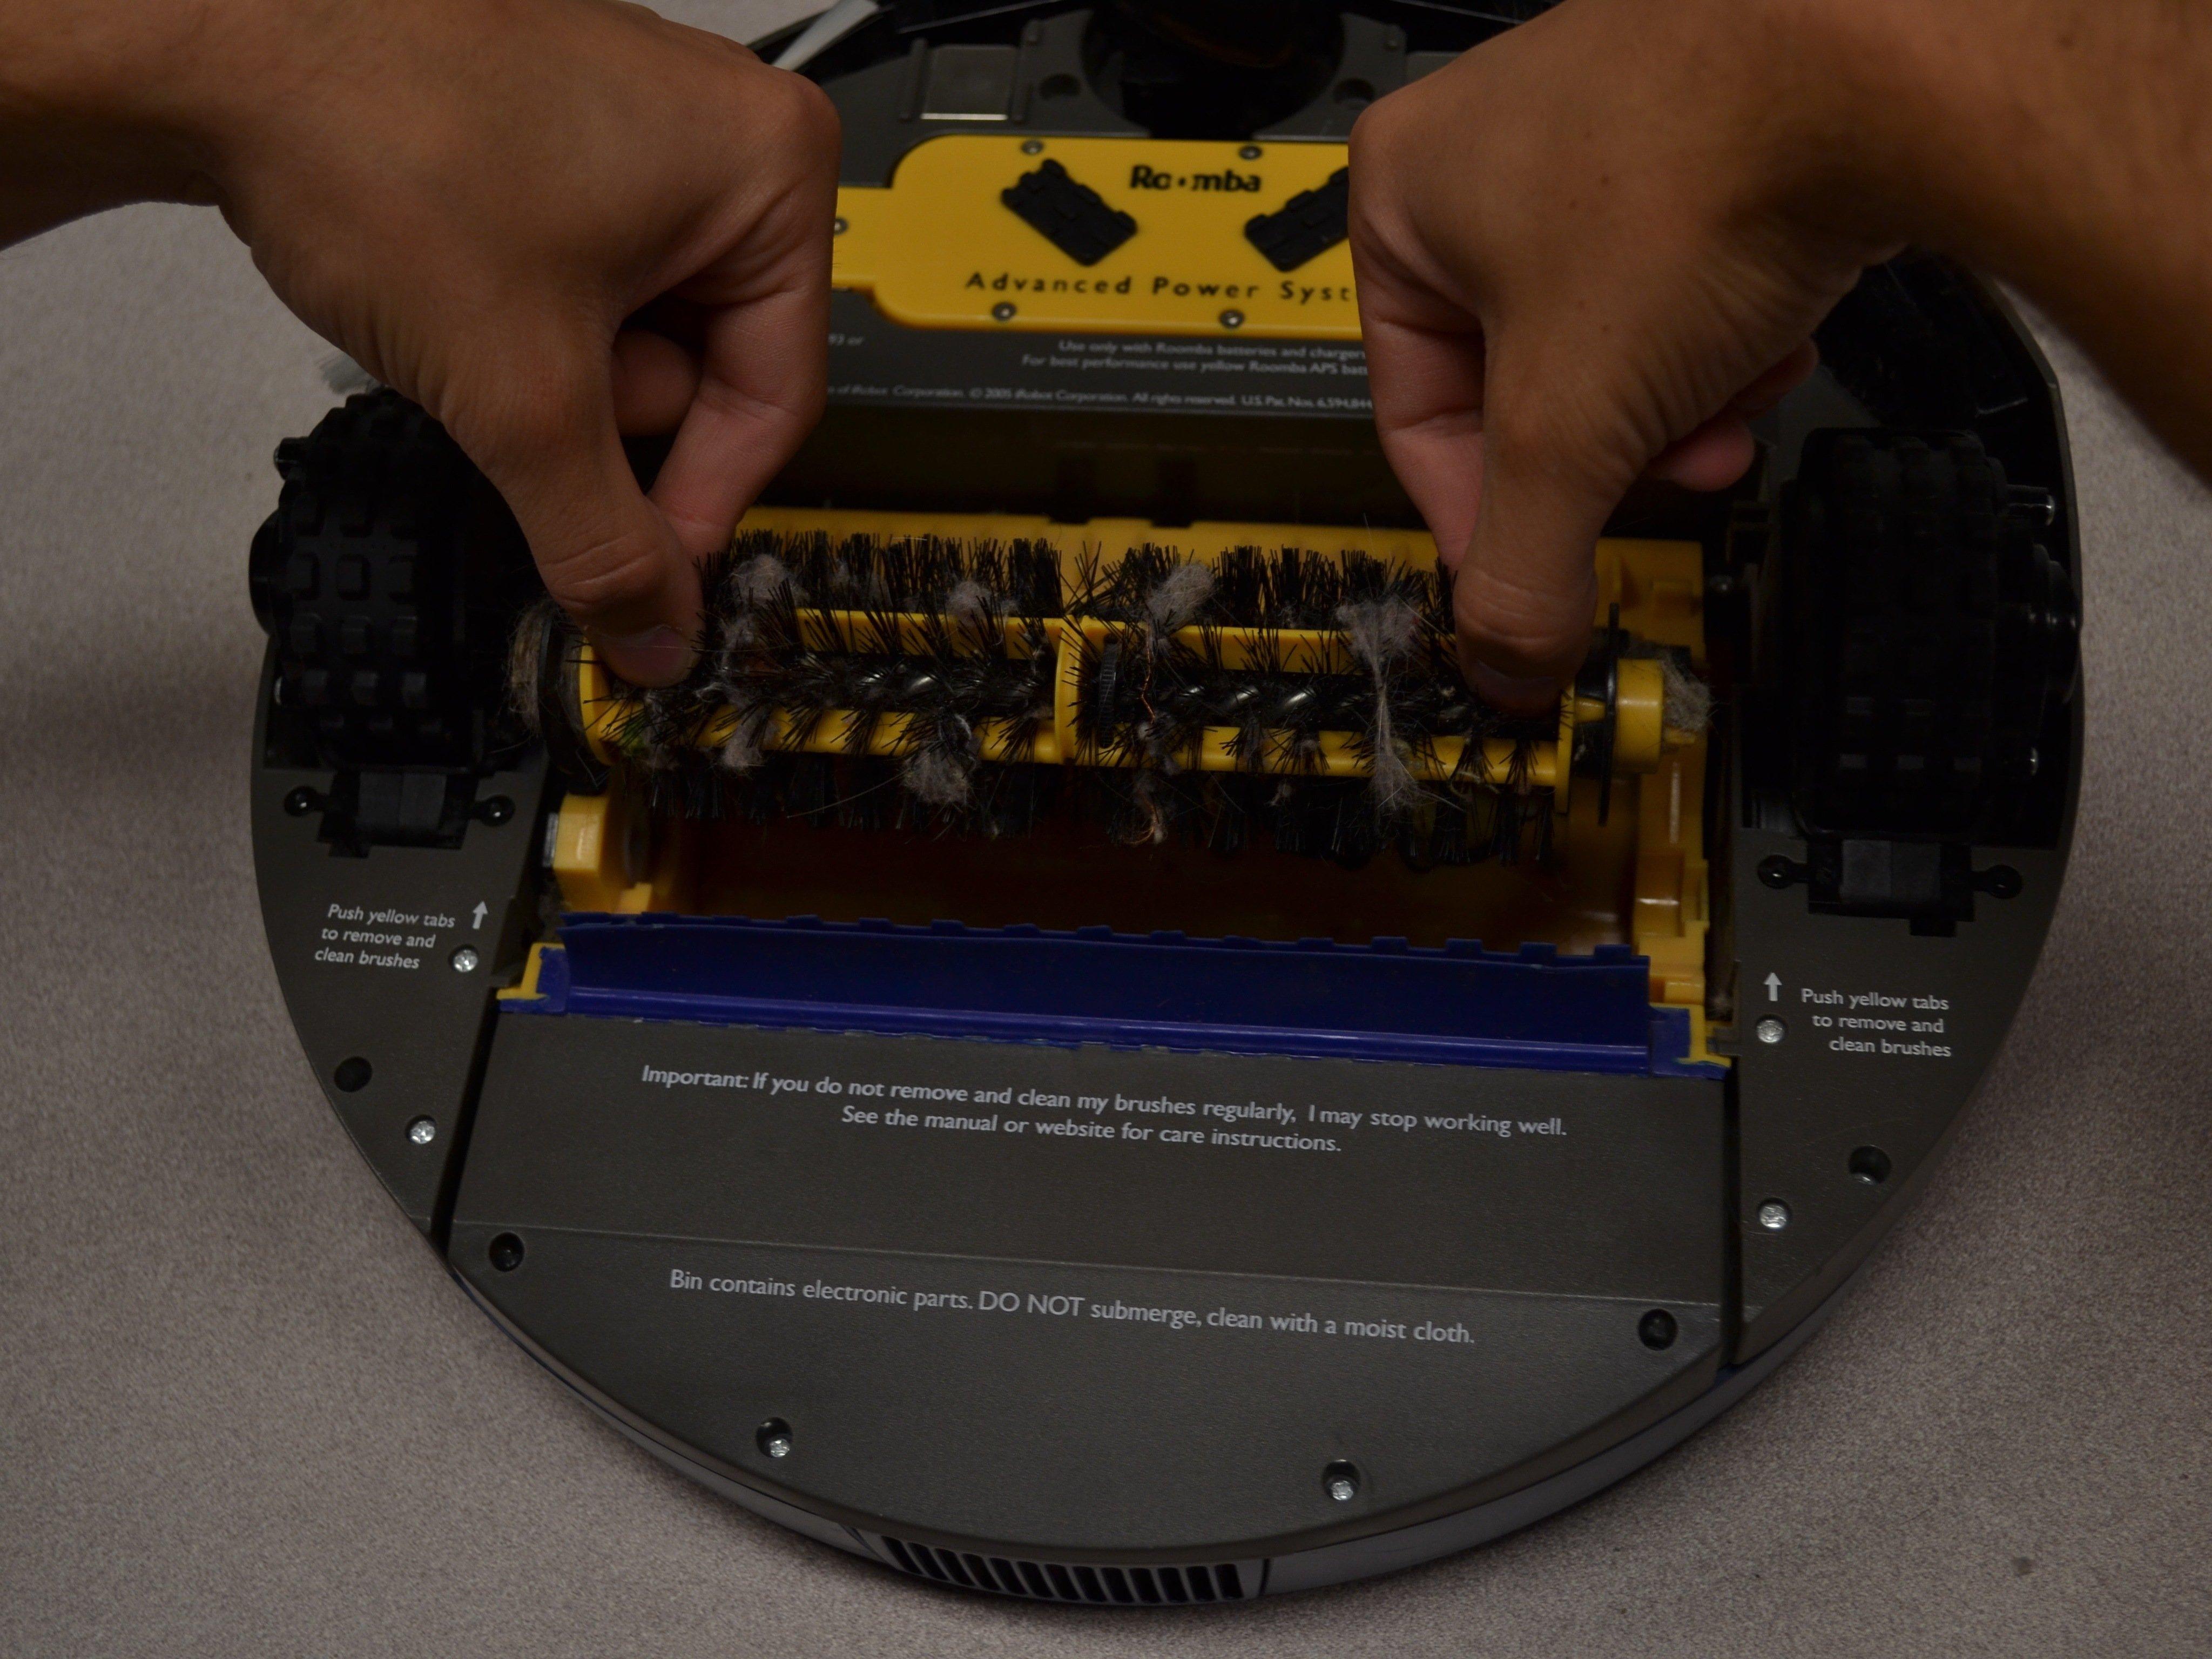 iRobot Roomba 4160 Brush Replacement - iFixit Repair Guide